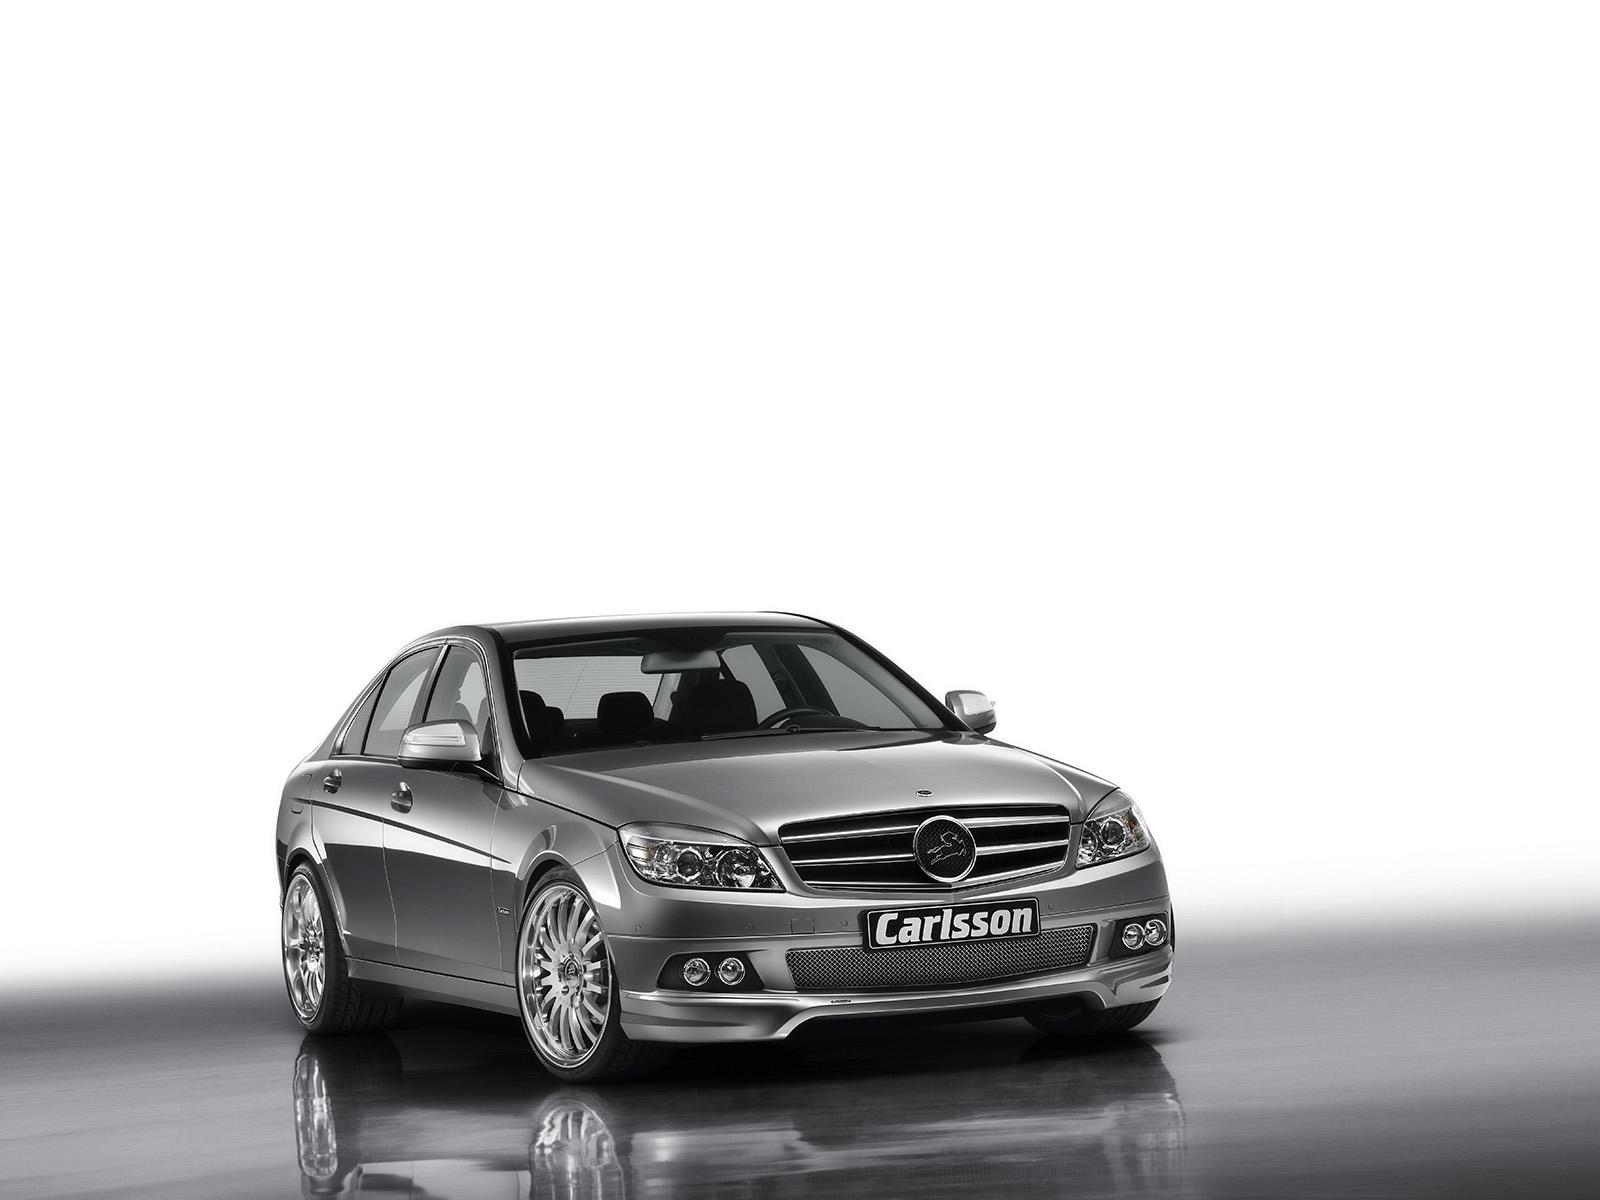 Mercedes benz logo wallpaper hd mobile wallpapers for Mobile mercedes benz